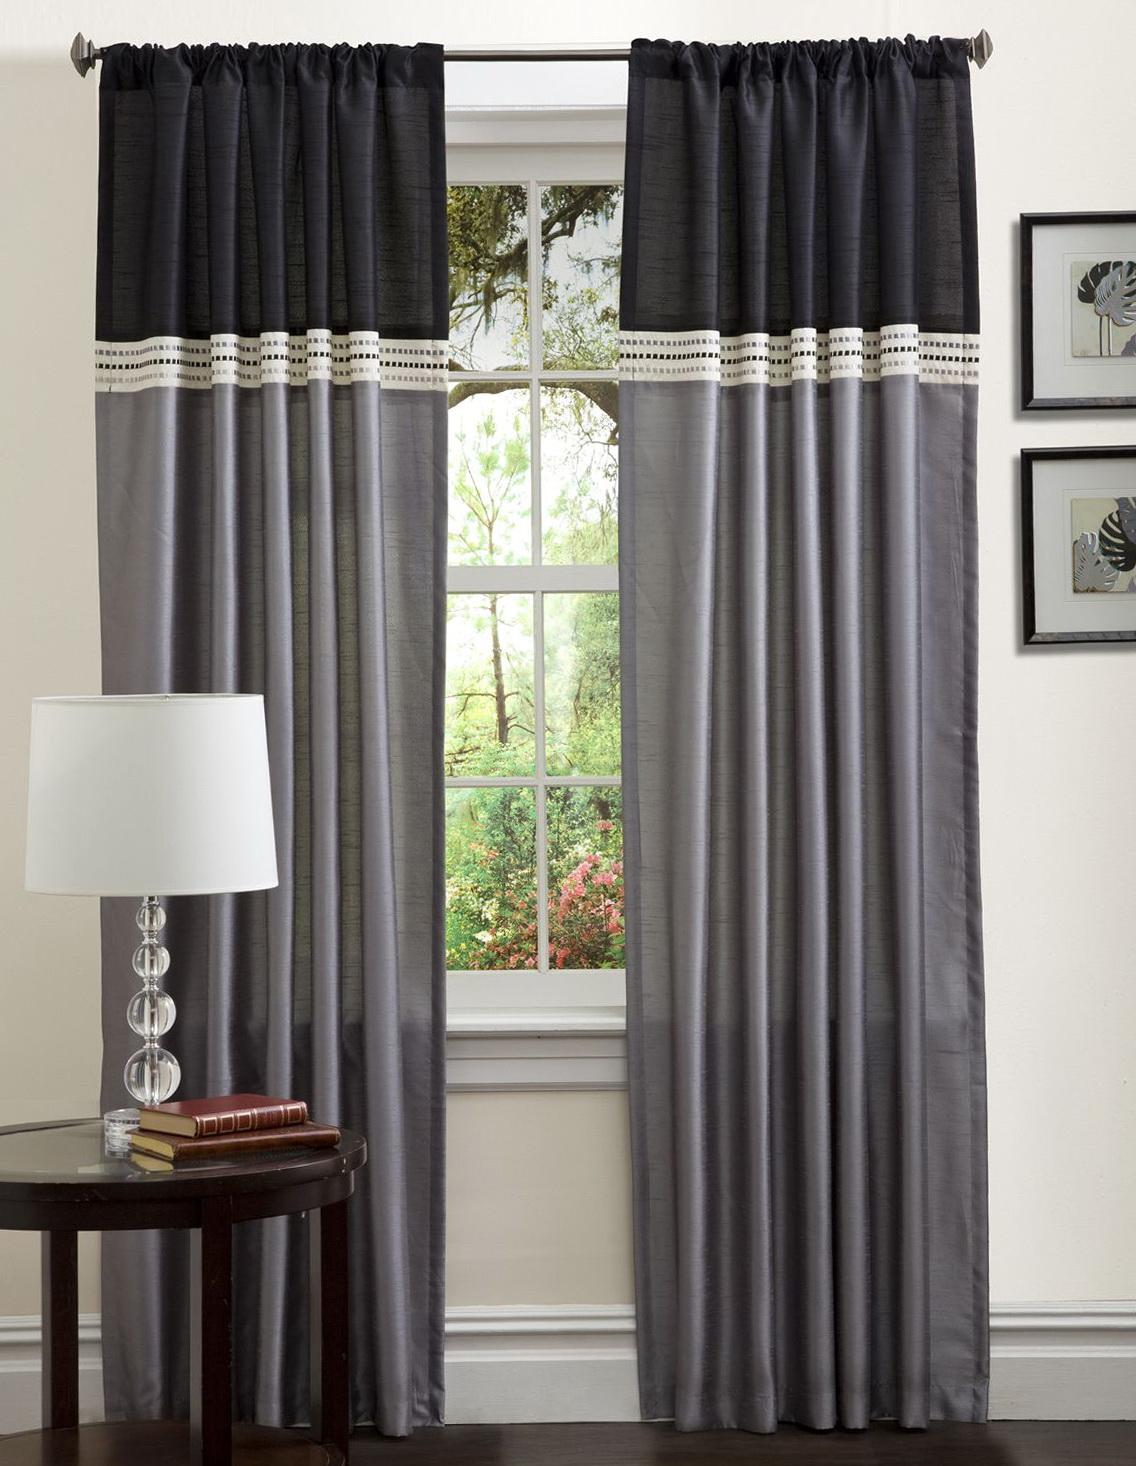 Curtain color ideas color block curtains diy home design ideas for Curtain color ideas living room